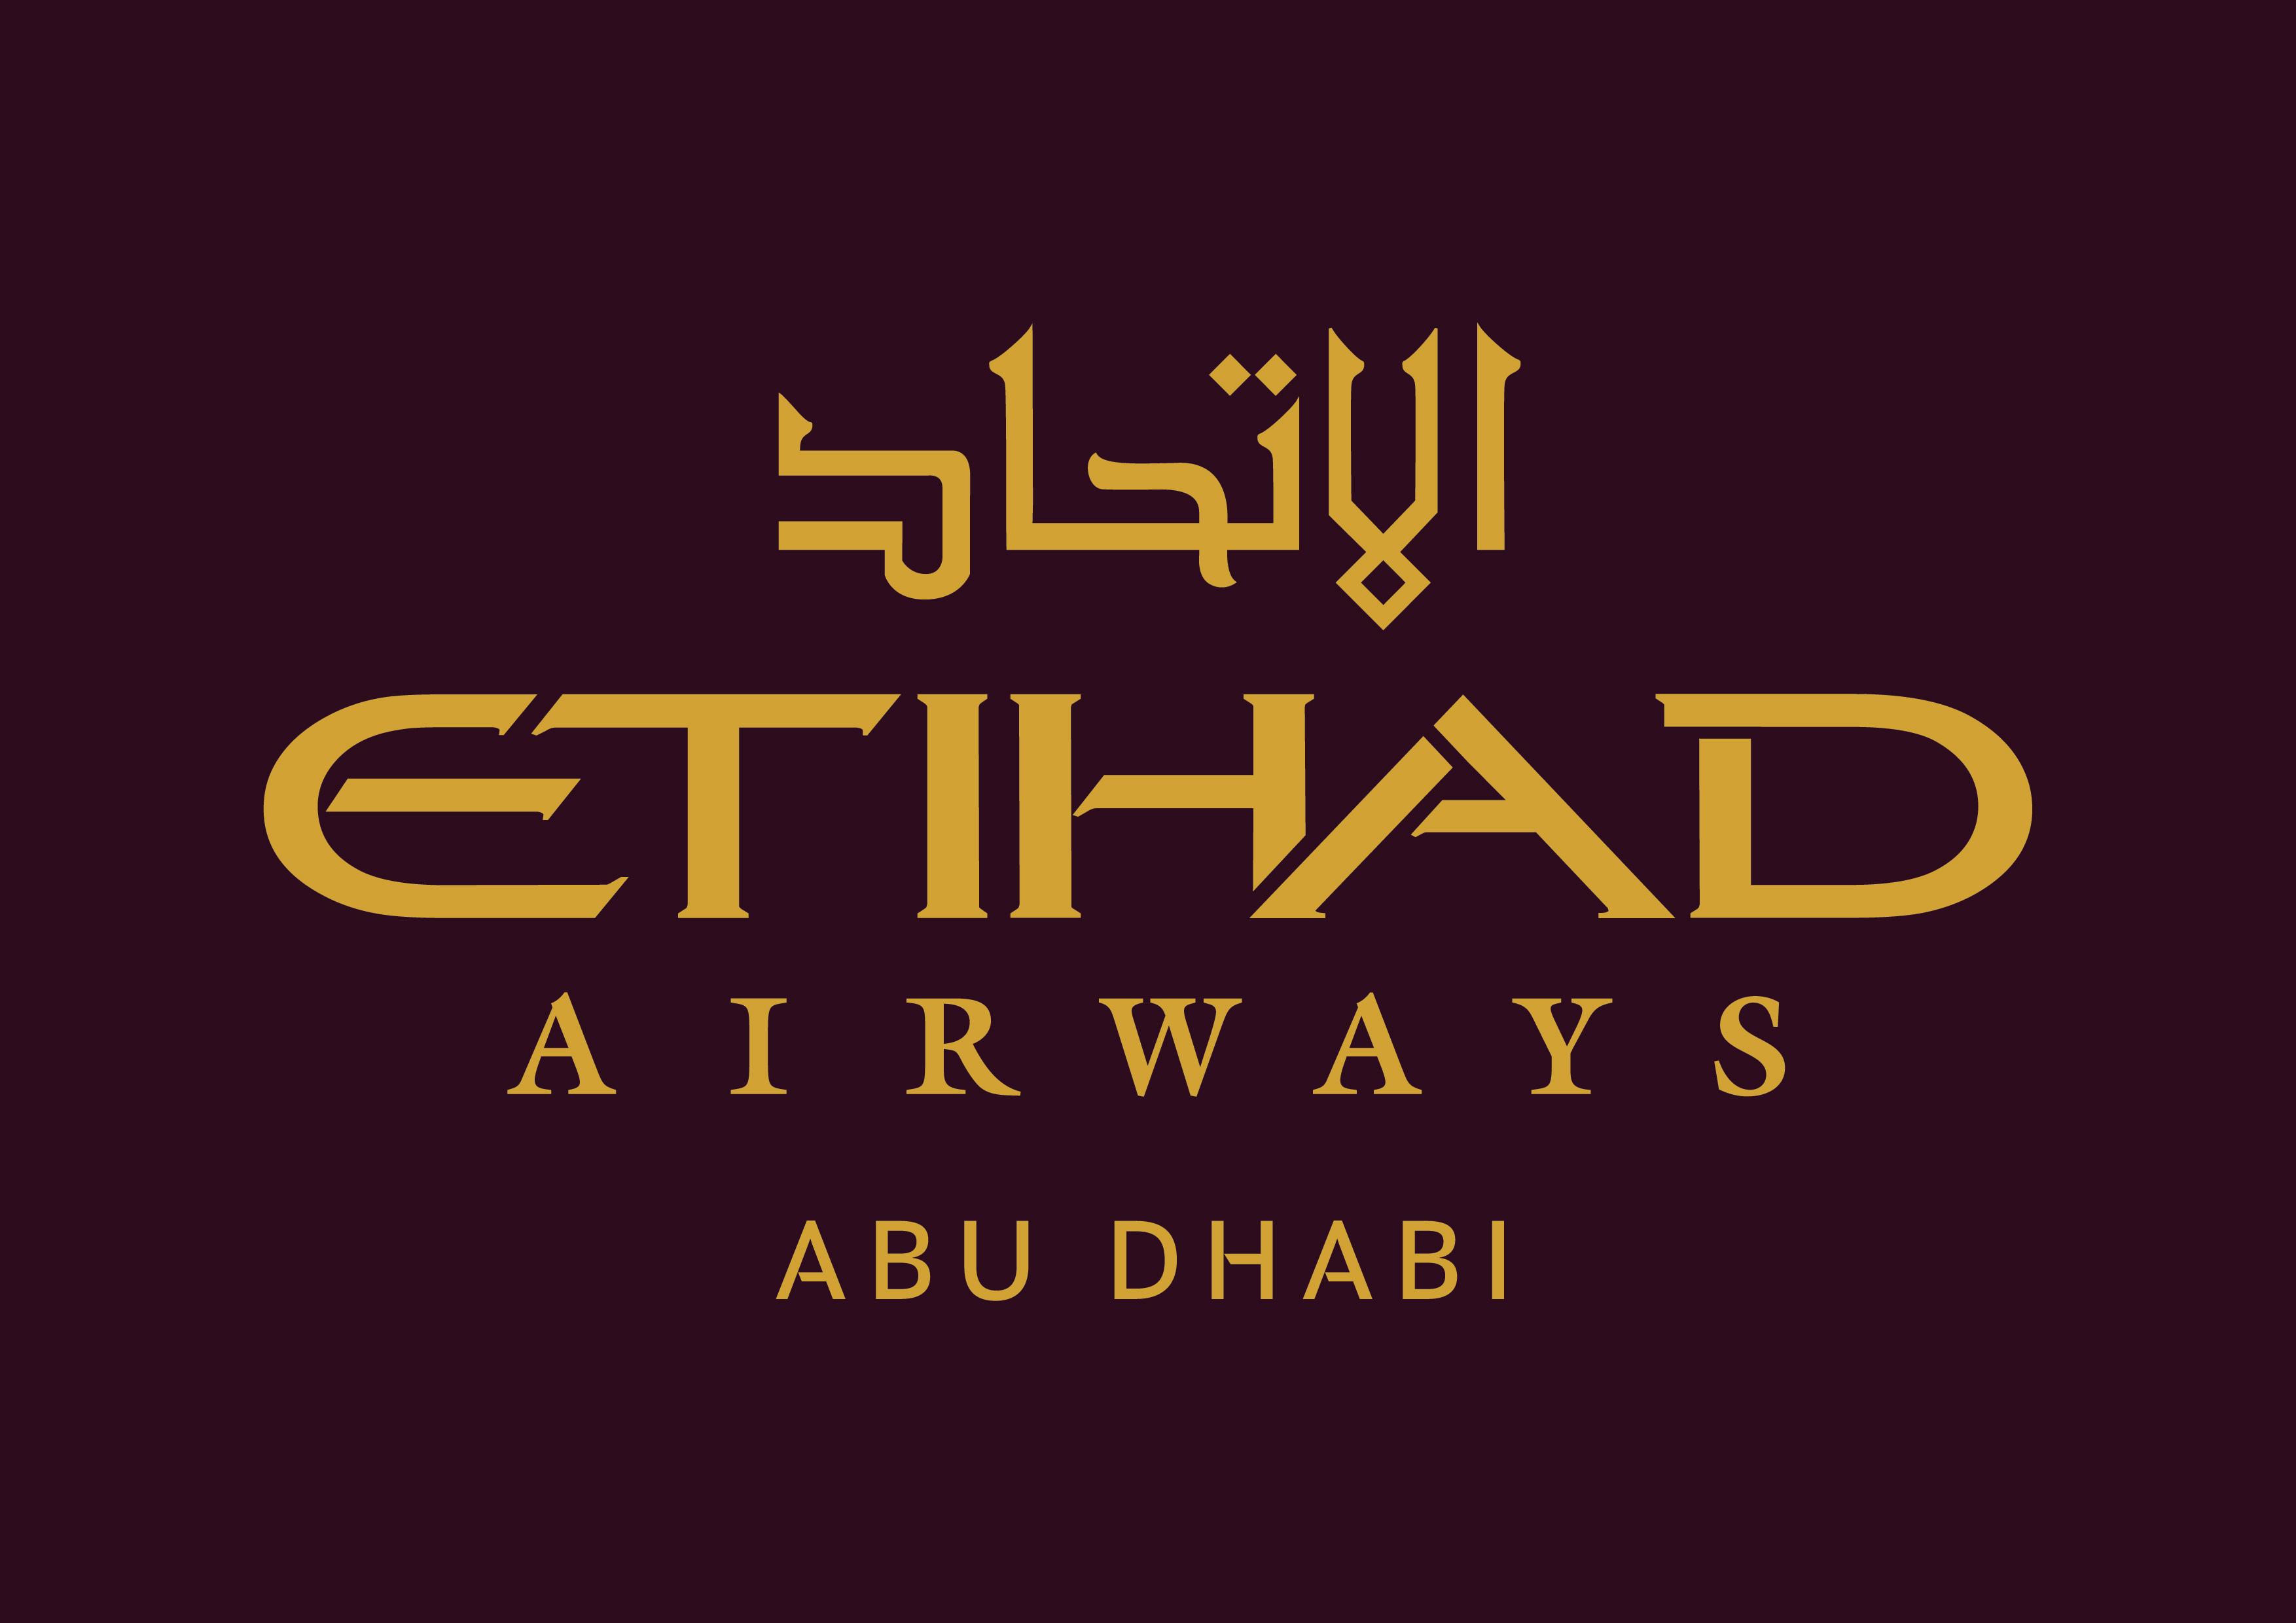 Etihad-Airways-logo-En - Point Hacks | 3508 x 2480 jpeg 410kB